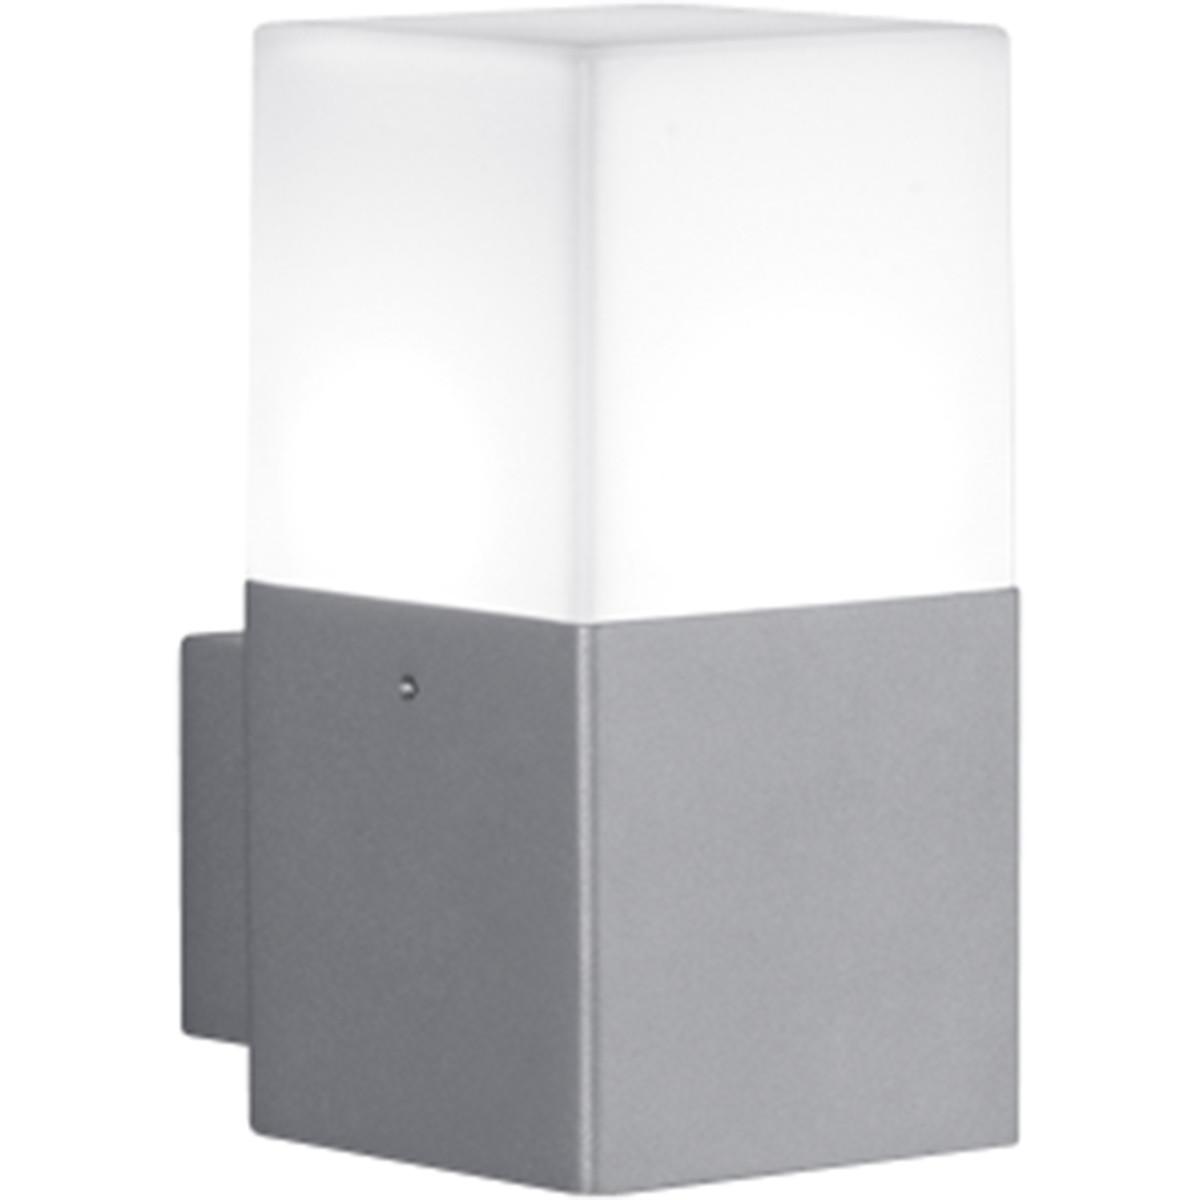 LED Tuinverlichting - Tuinlamp - Trion Hudsy - Wand - 4W - Warm Wit 3000K - Vierkant - Mat Titaan -